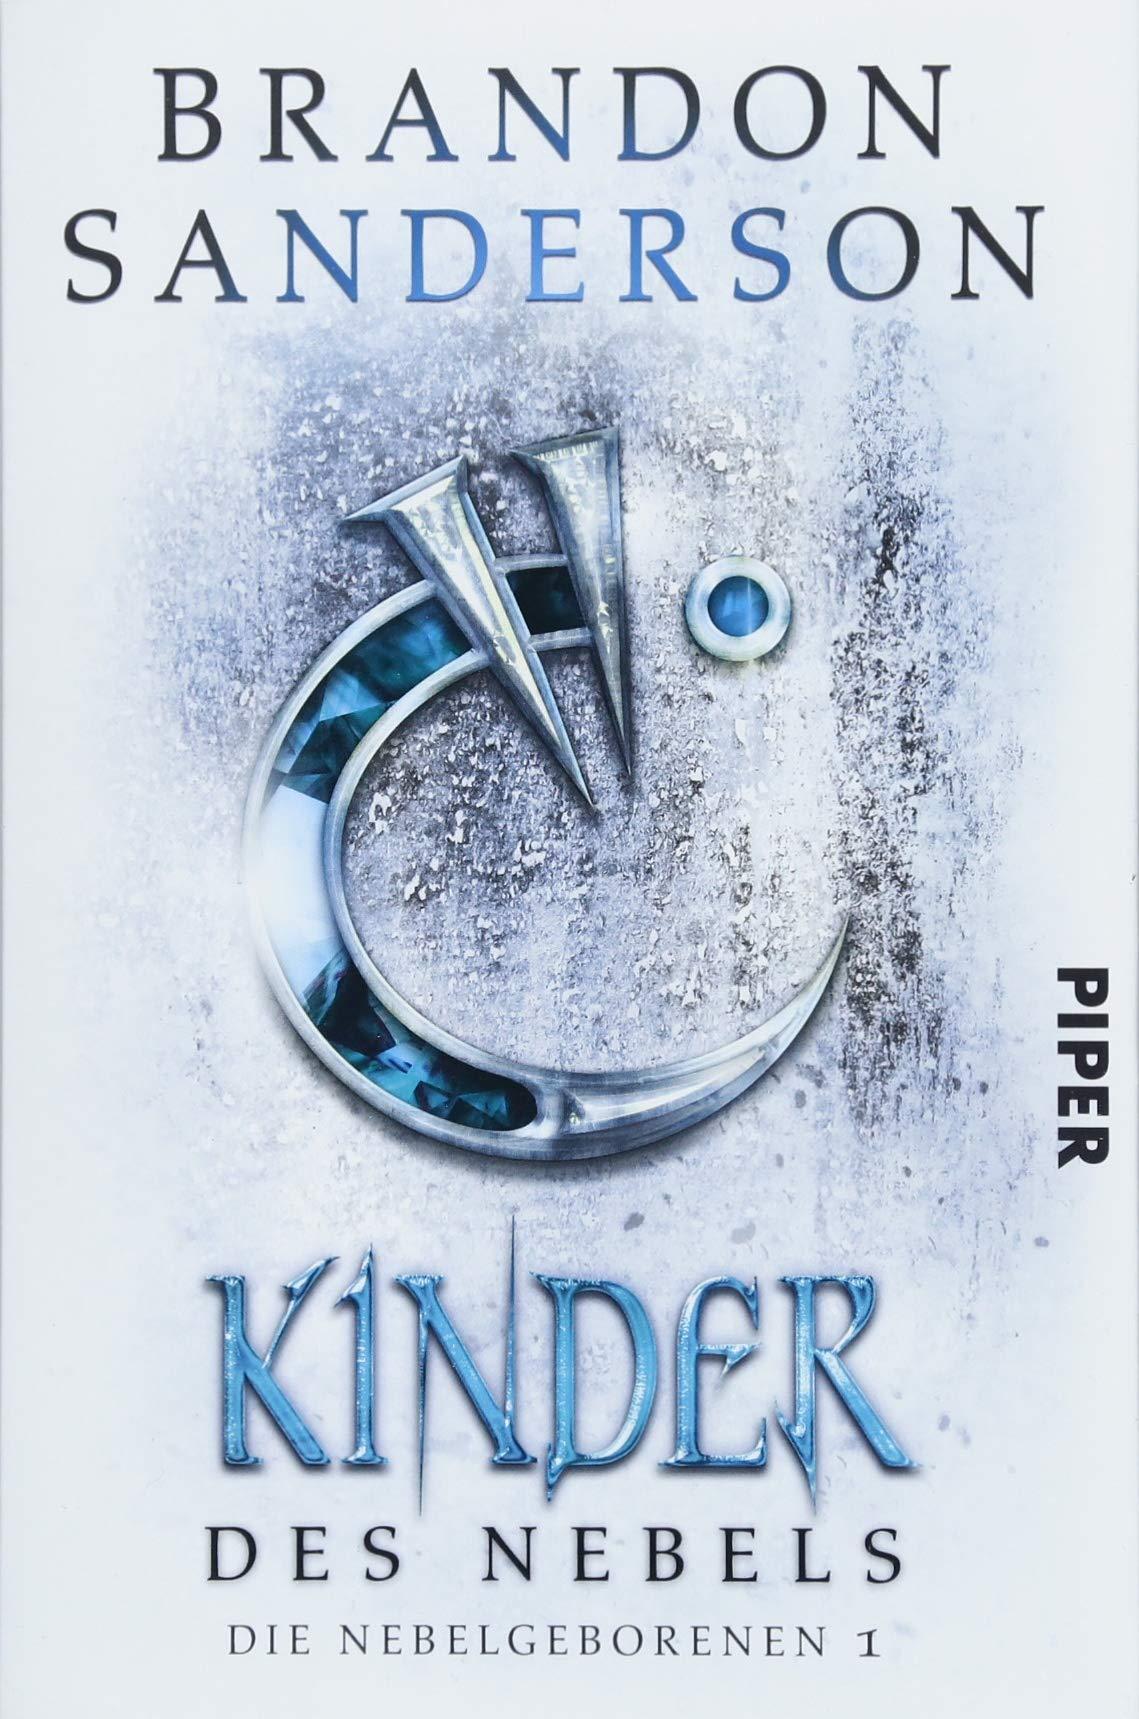 kinder-des-nebels-die-nebelgeborenen-1